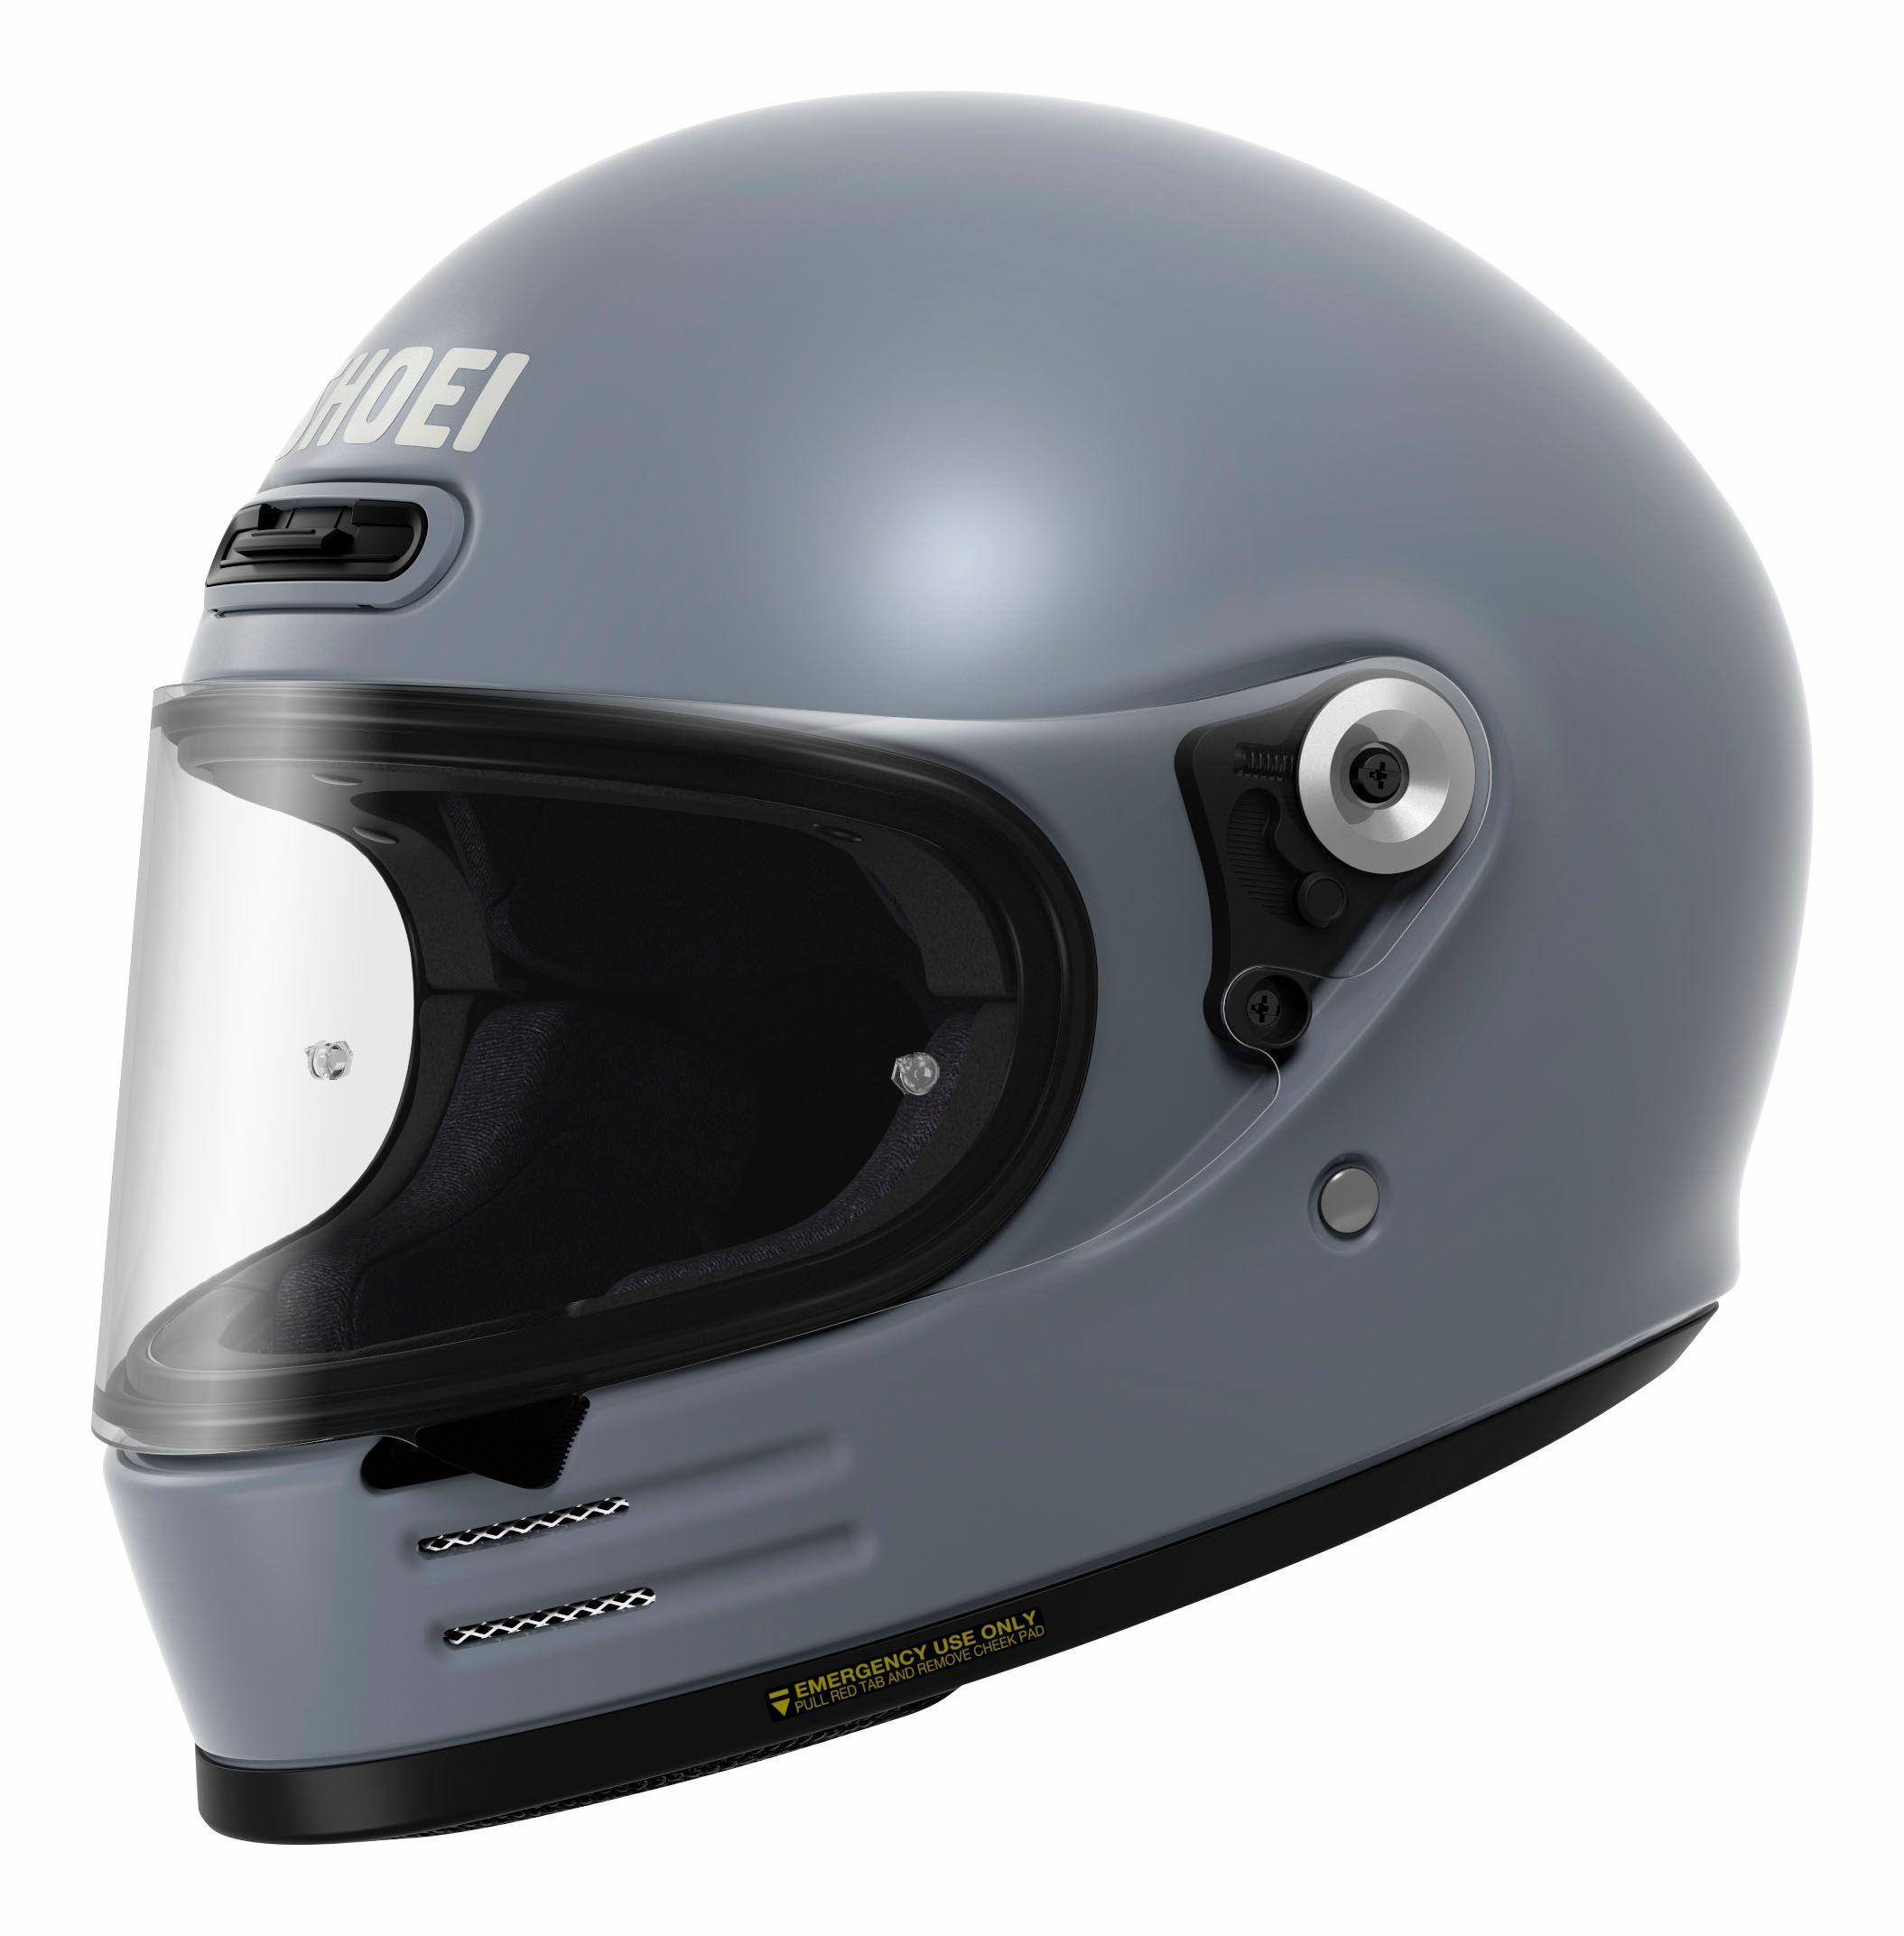 Shoei Glamster Basalt Grey Ece Retro Motorcycle Helmets Helmet Retro Motorcycle